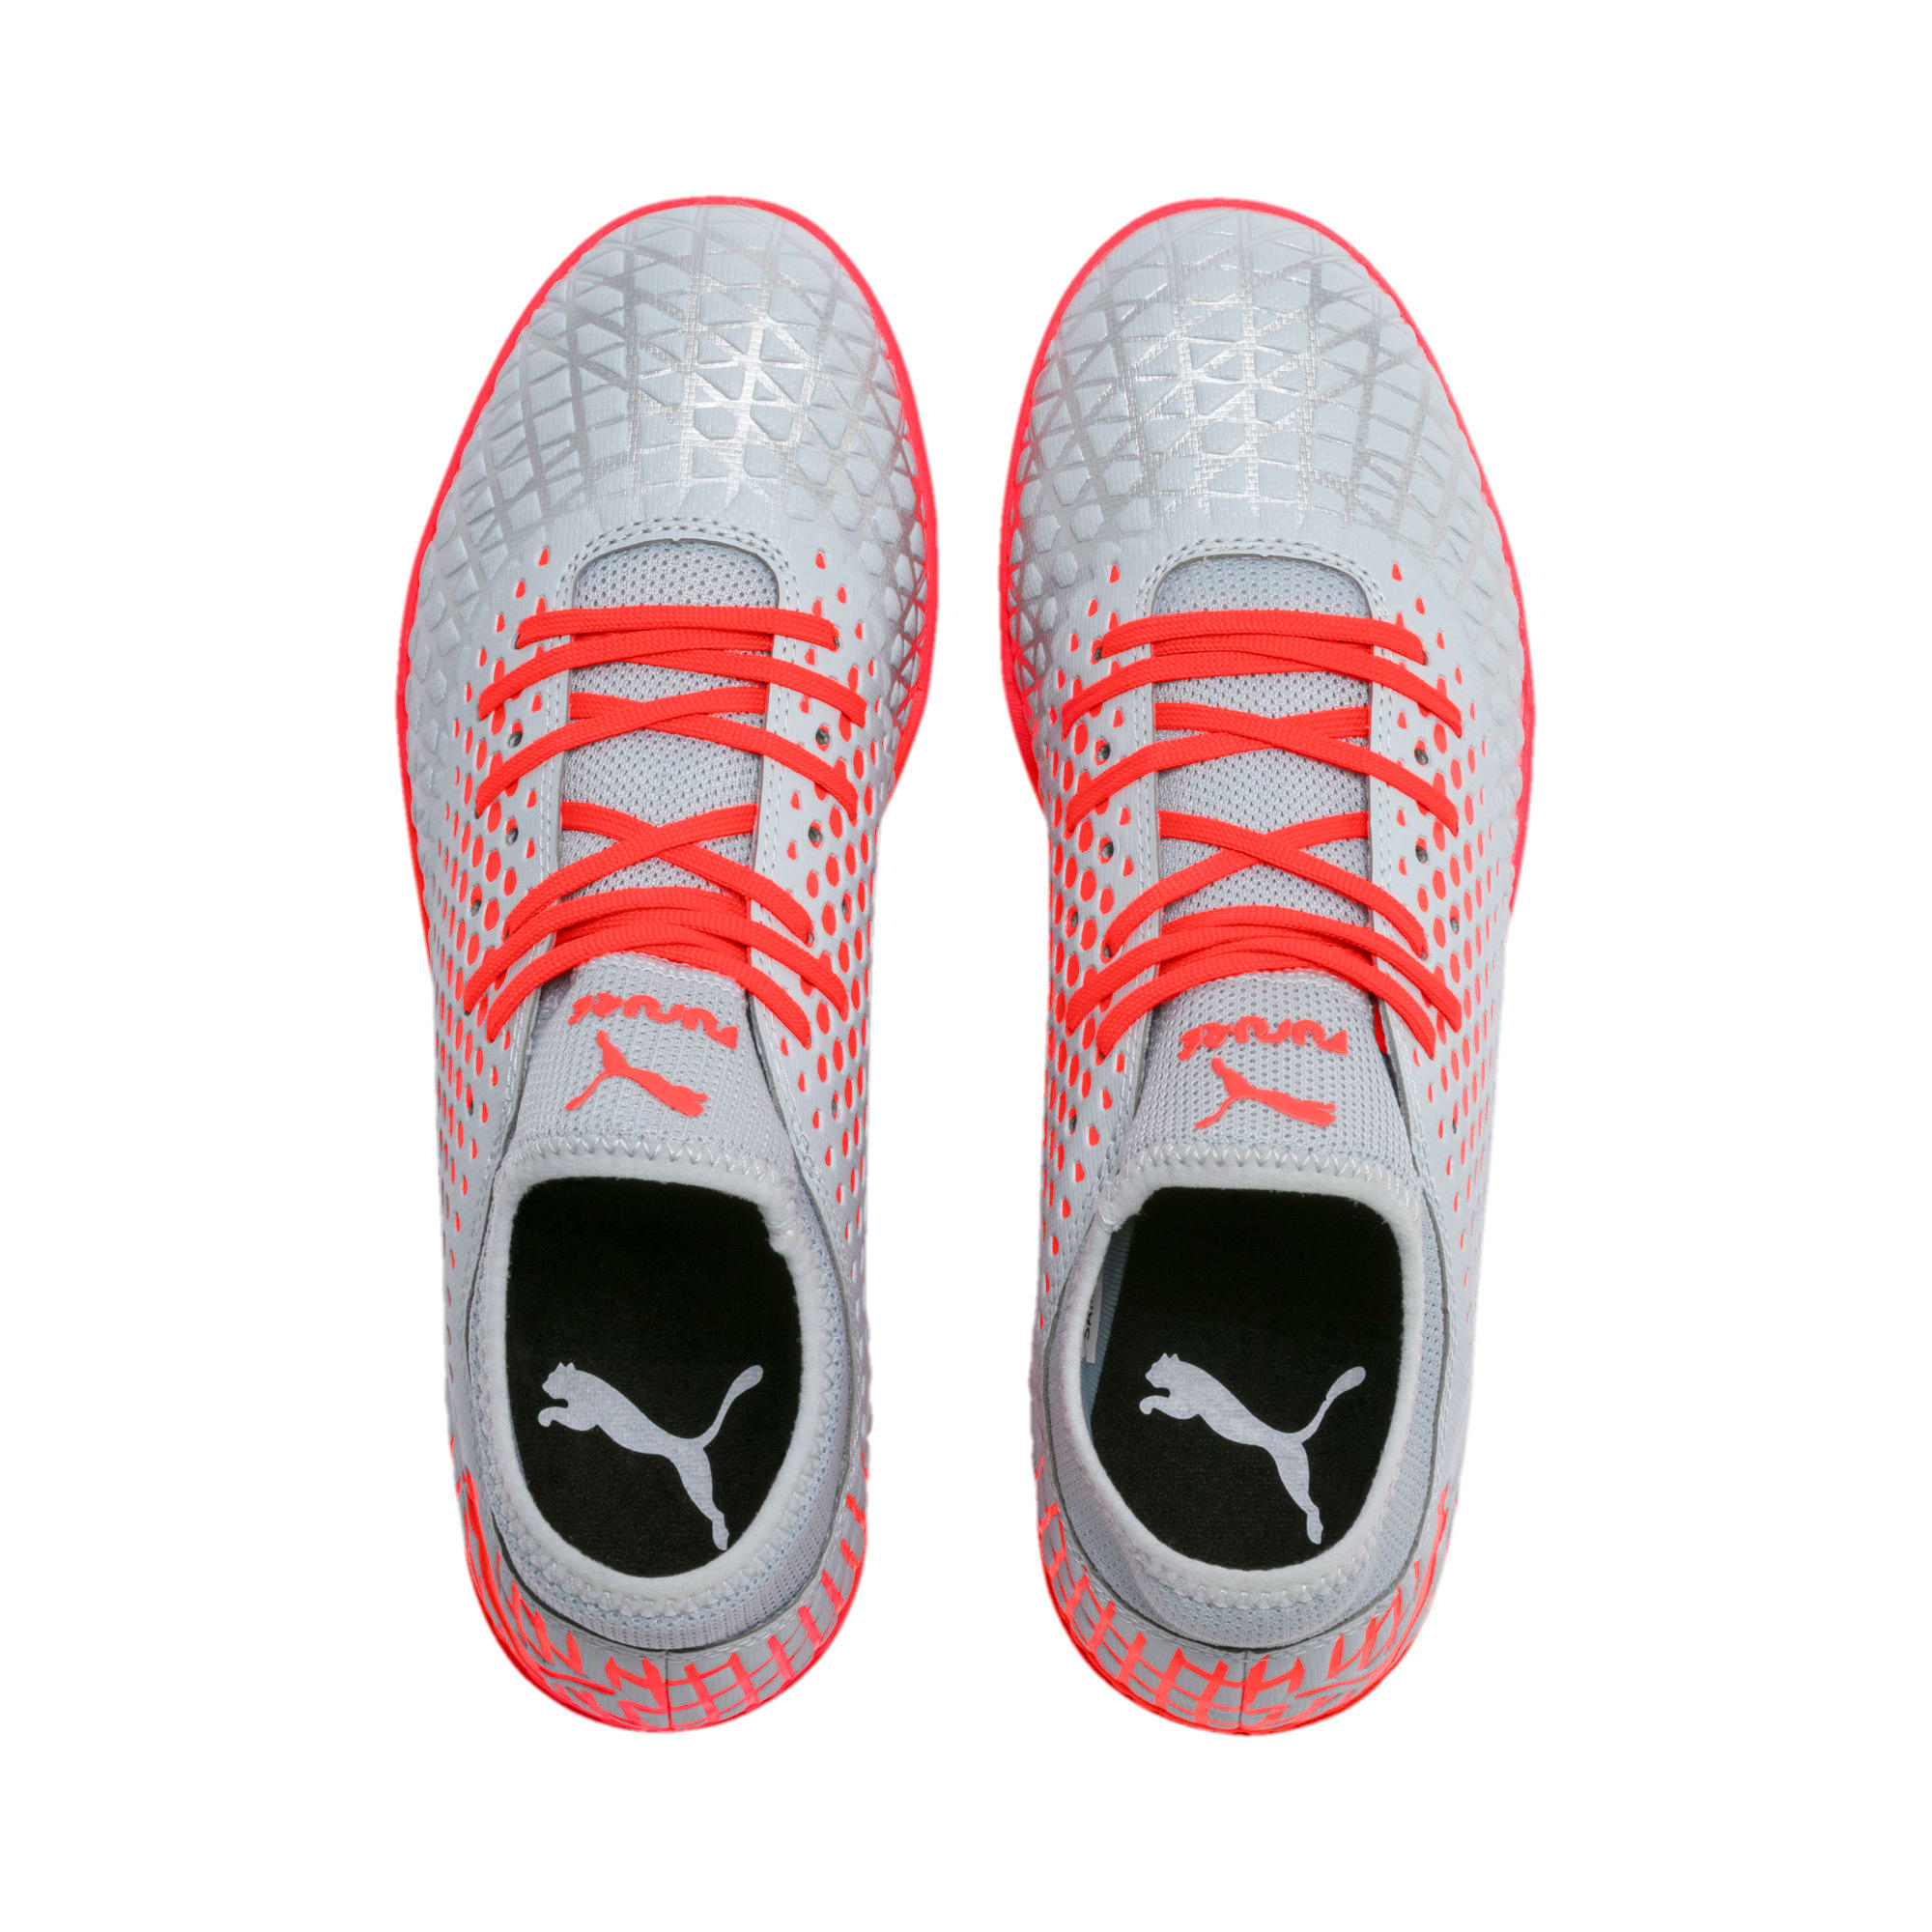 Thumbnail 7 of FUTURE 4.4 TT Men's Soccer Shoes, Glacial Blue-Nrgy Red, medium